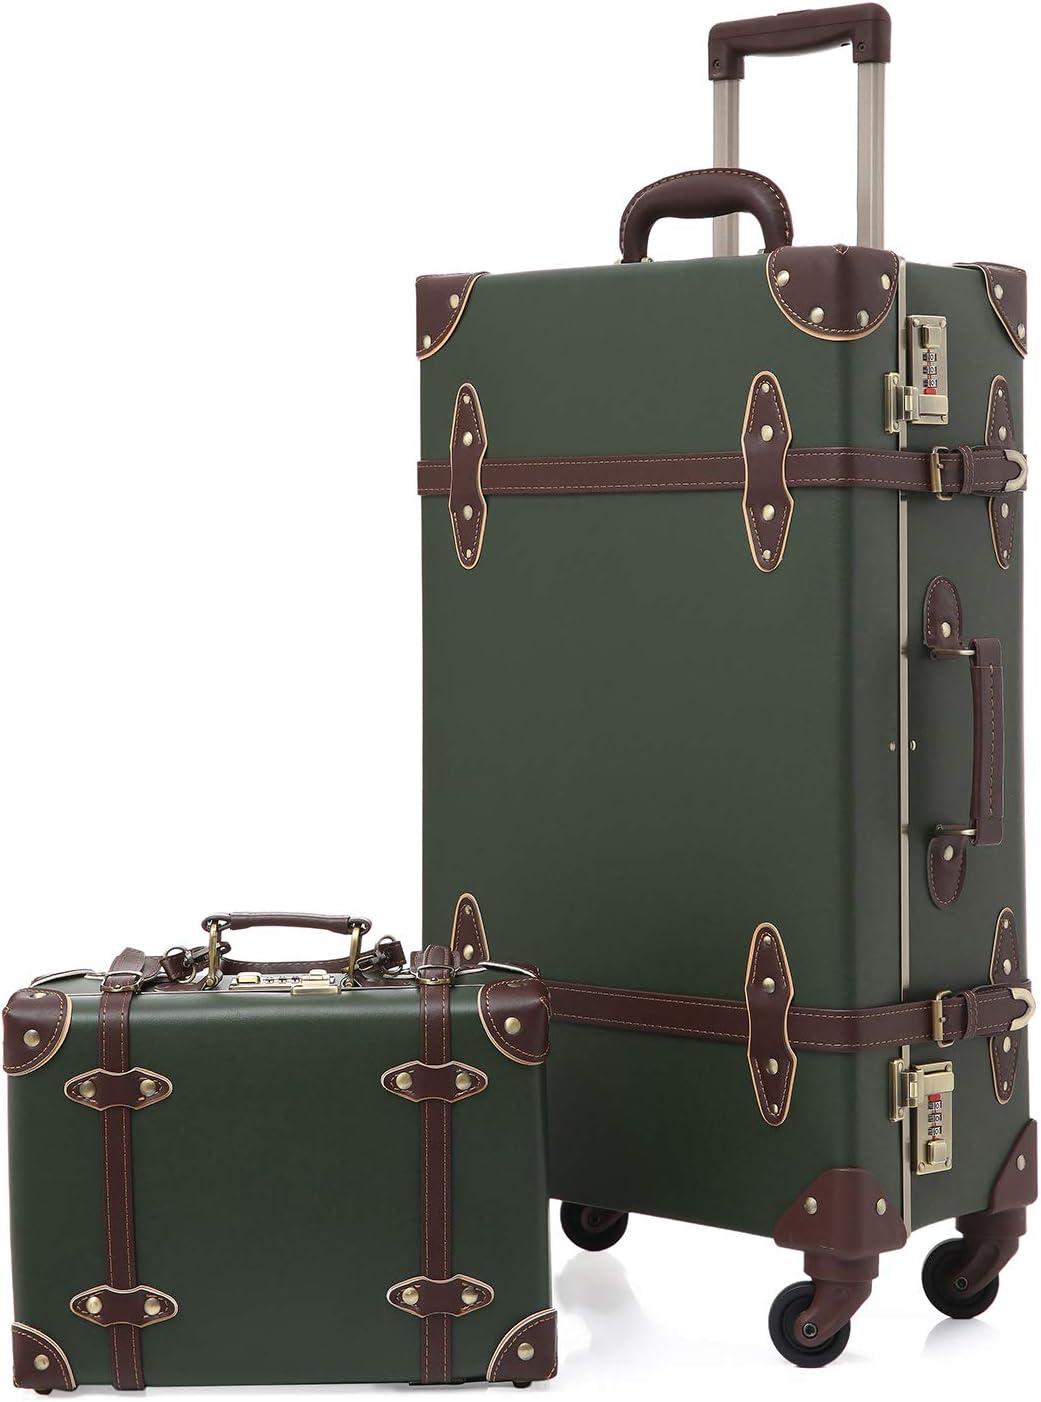 1. Urecity Vintage miglior set valigie da due pezzi